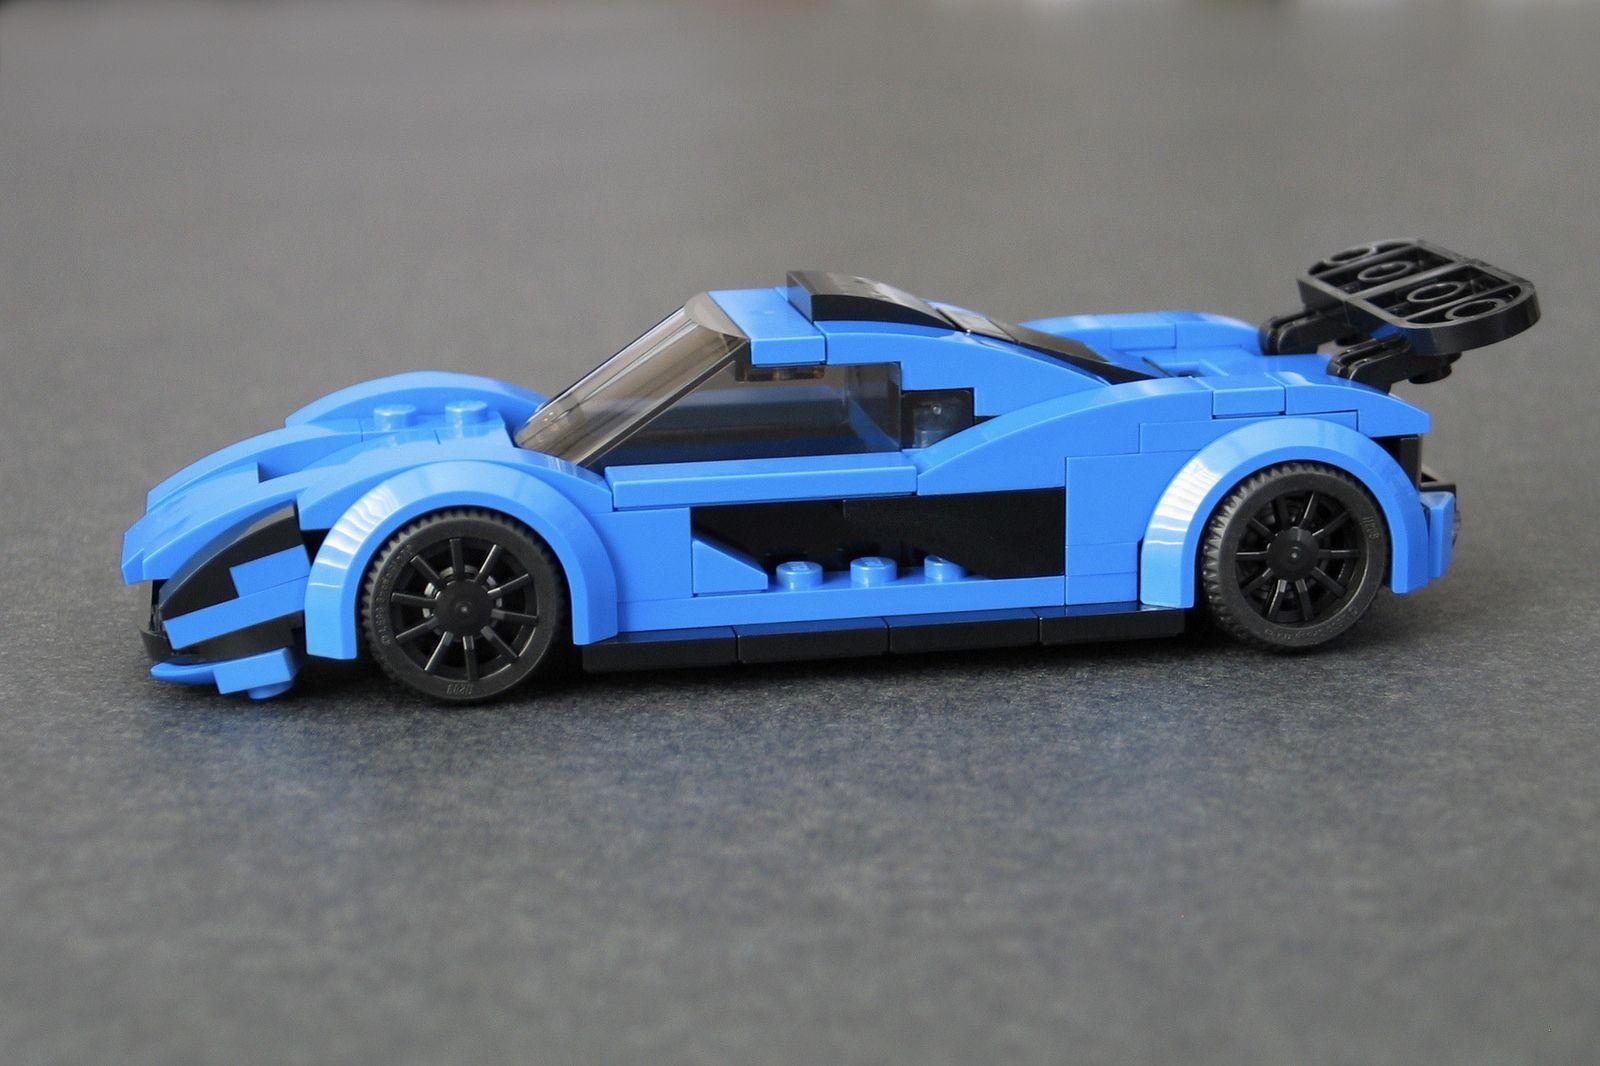 mclaren p1 (city scale) | lego moc | lego, lego creations, lego city